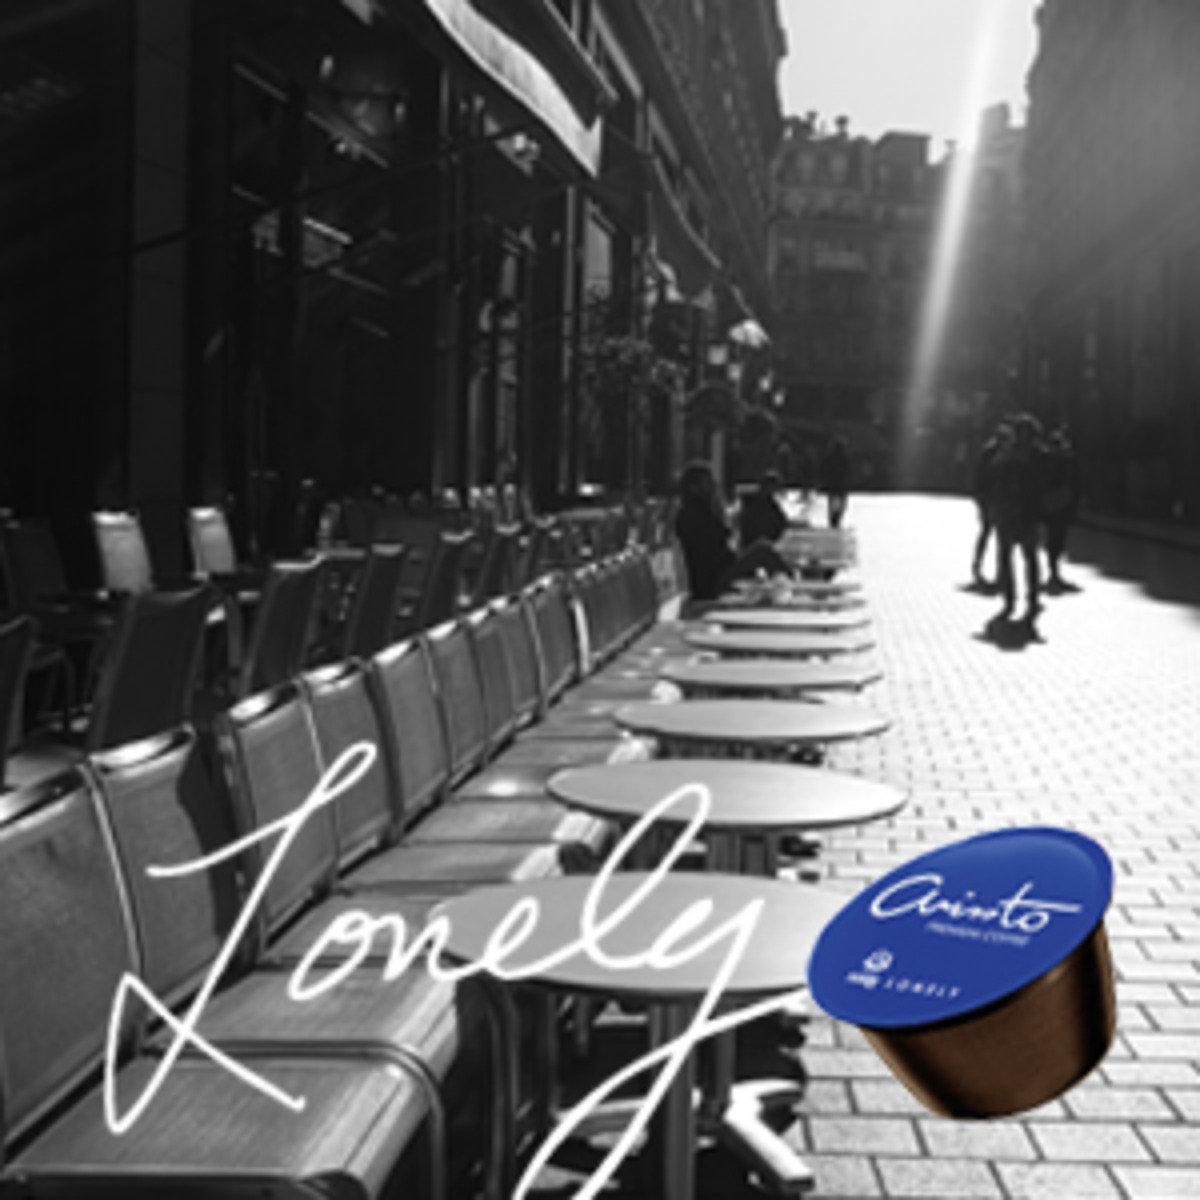 精品咖啡粉囊  - Lonely